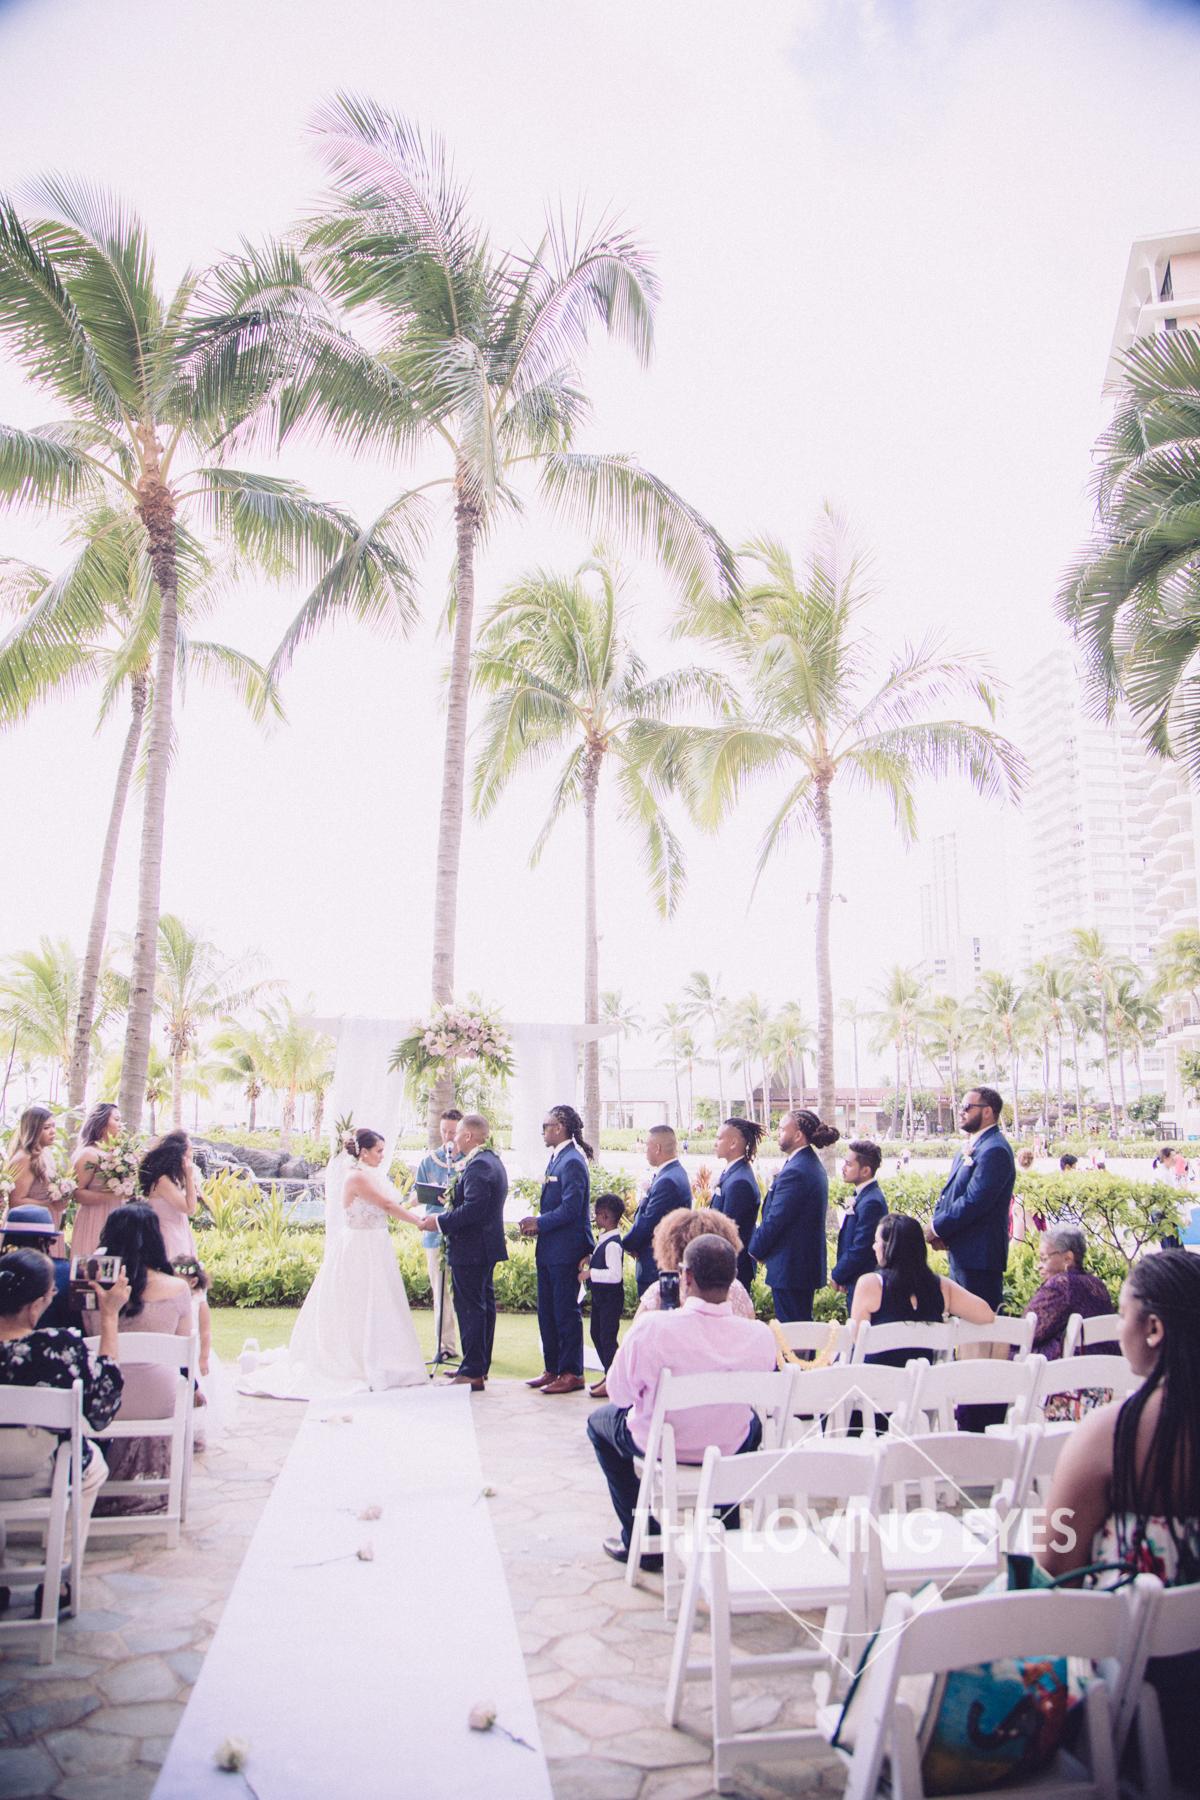 Bride and Groom during wedding ceremony at Hilton Hawaiian Village Rainbow Suite in Waikiki